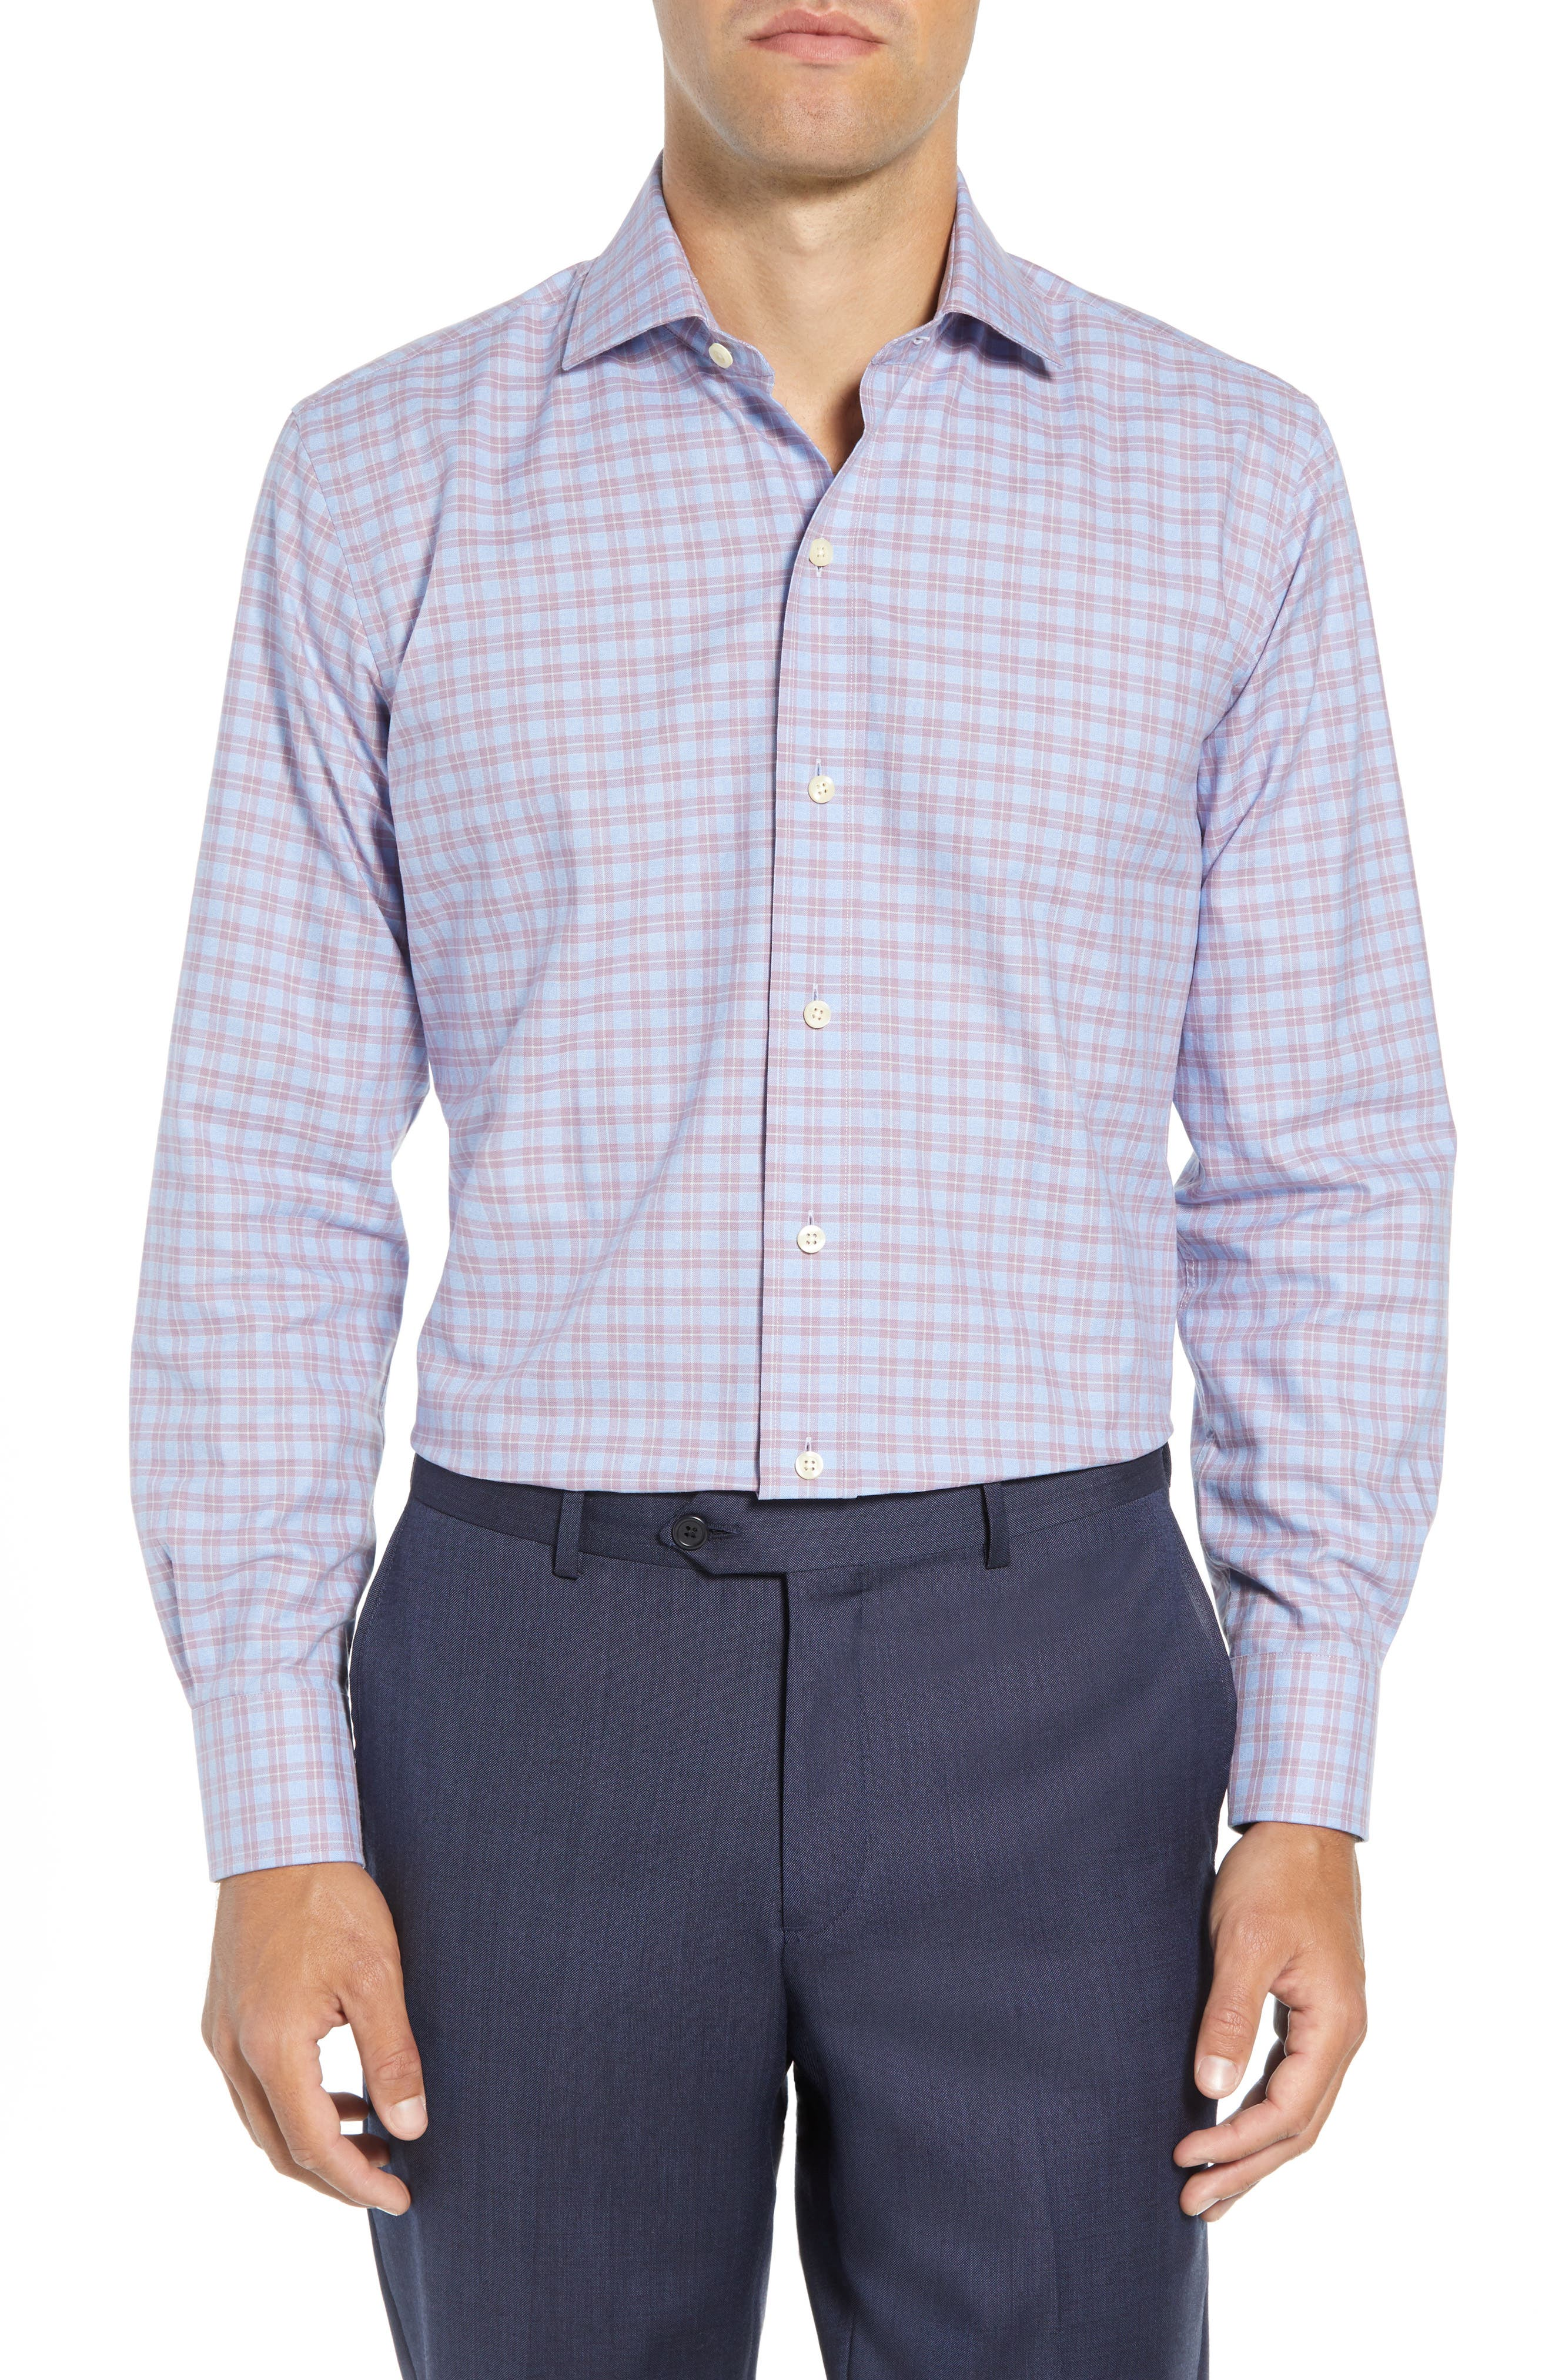 LEDBURY Sondra Trim Fit Check Dress Shirt in Lilac